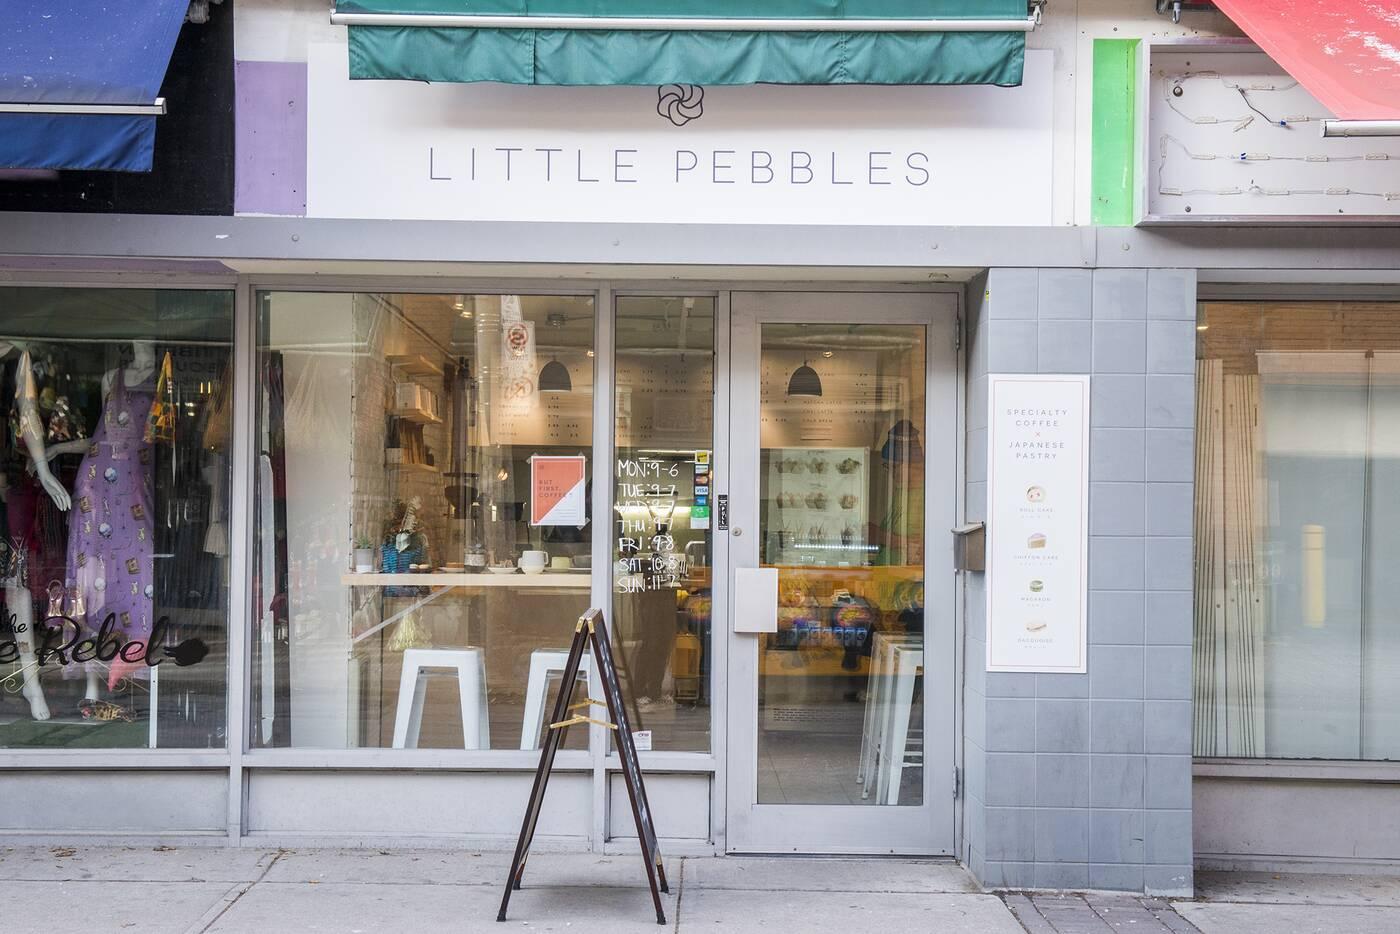 Little Pebbles Cafe Toronto